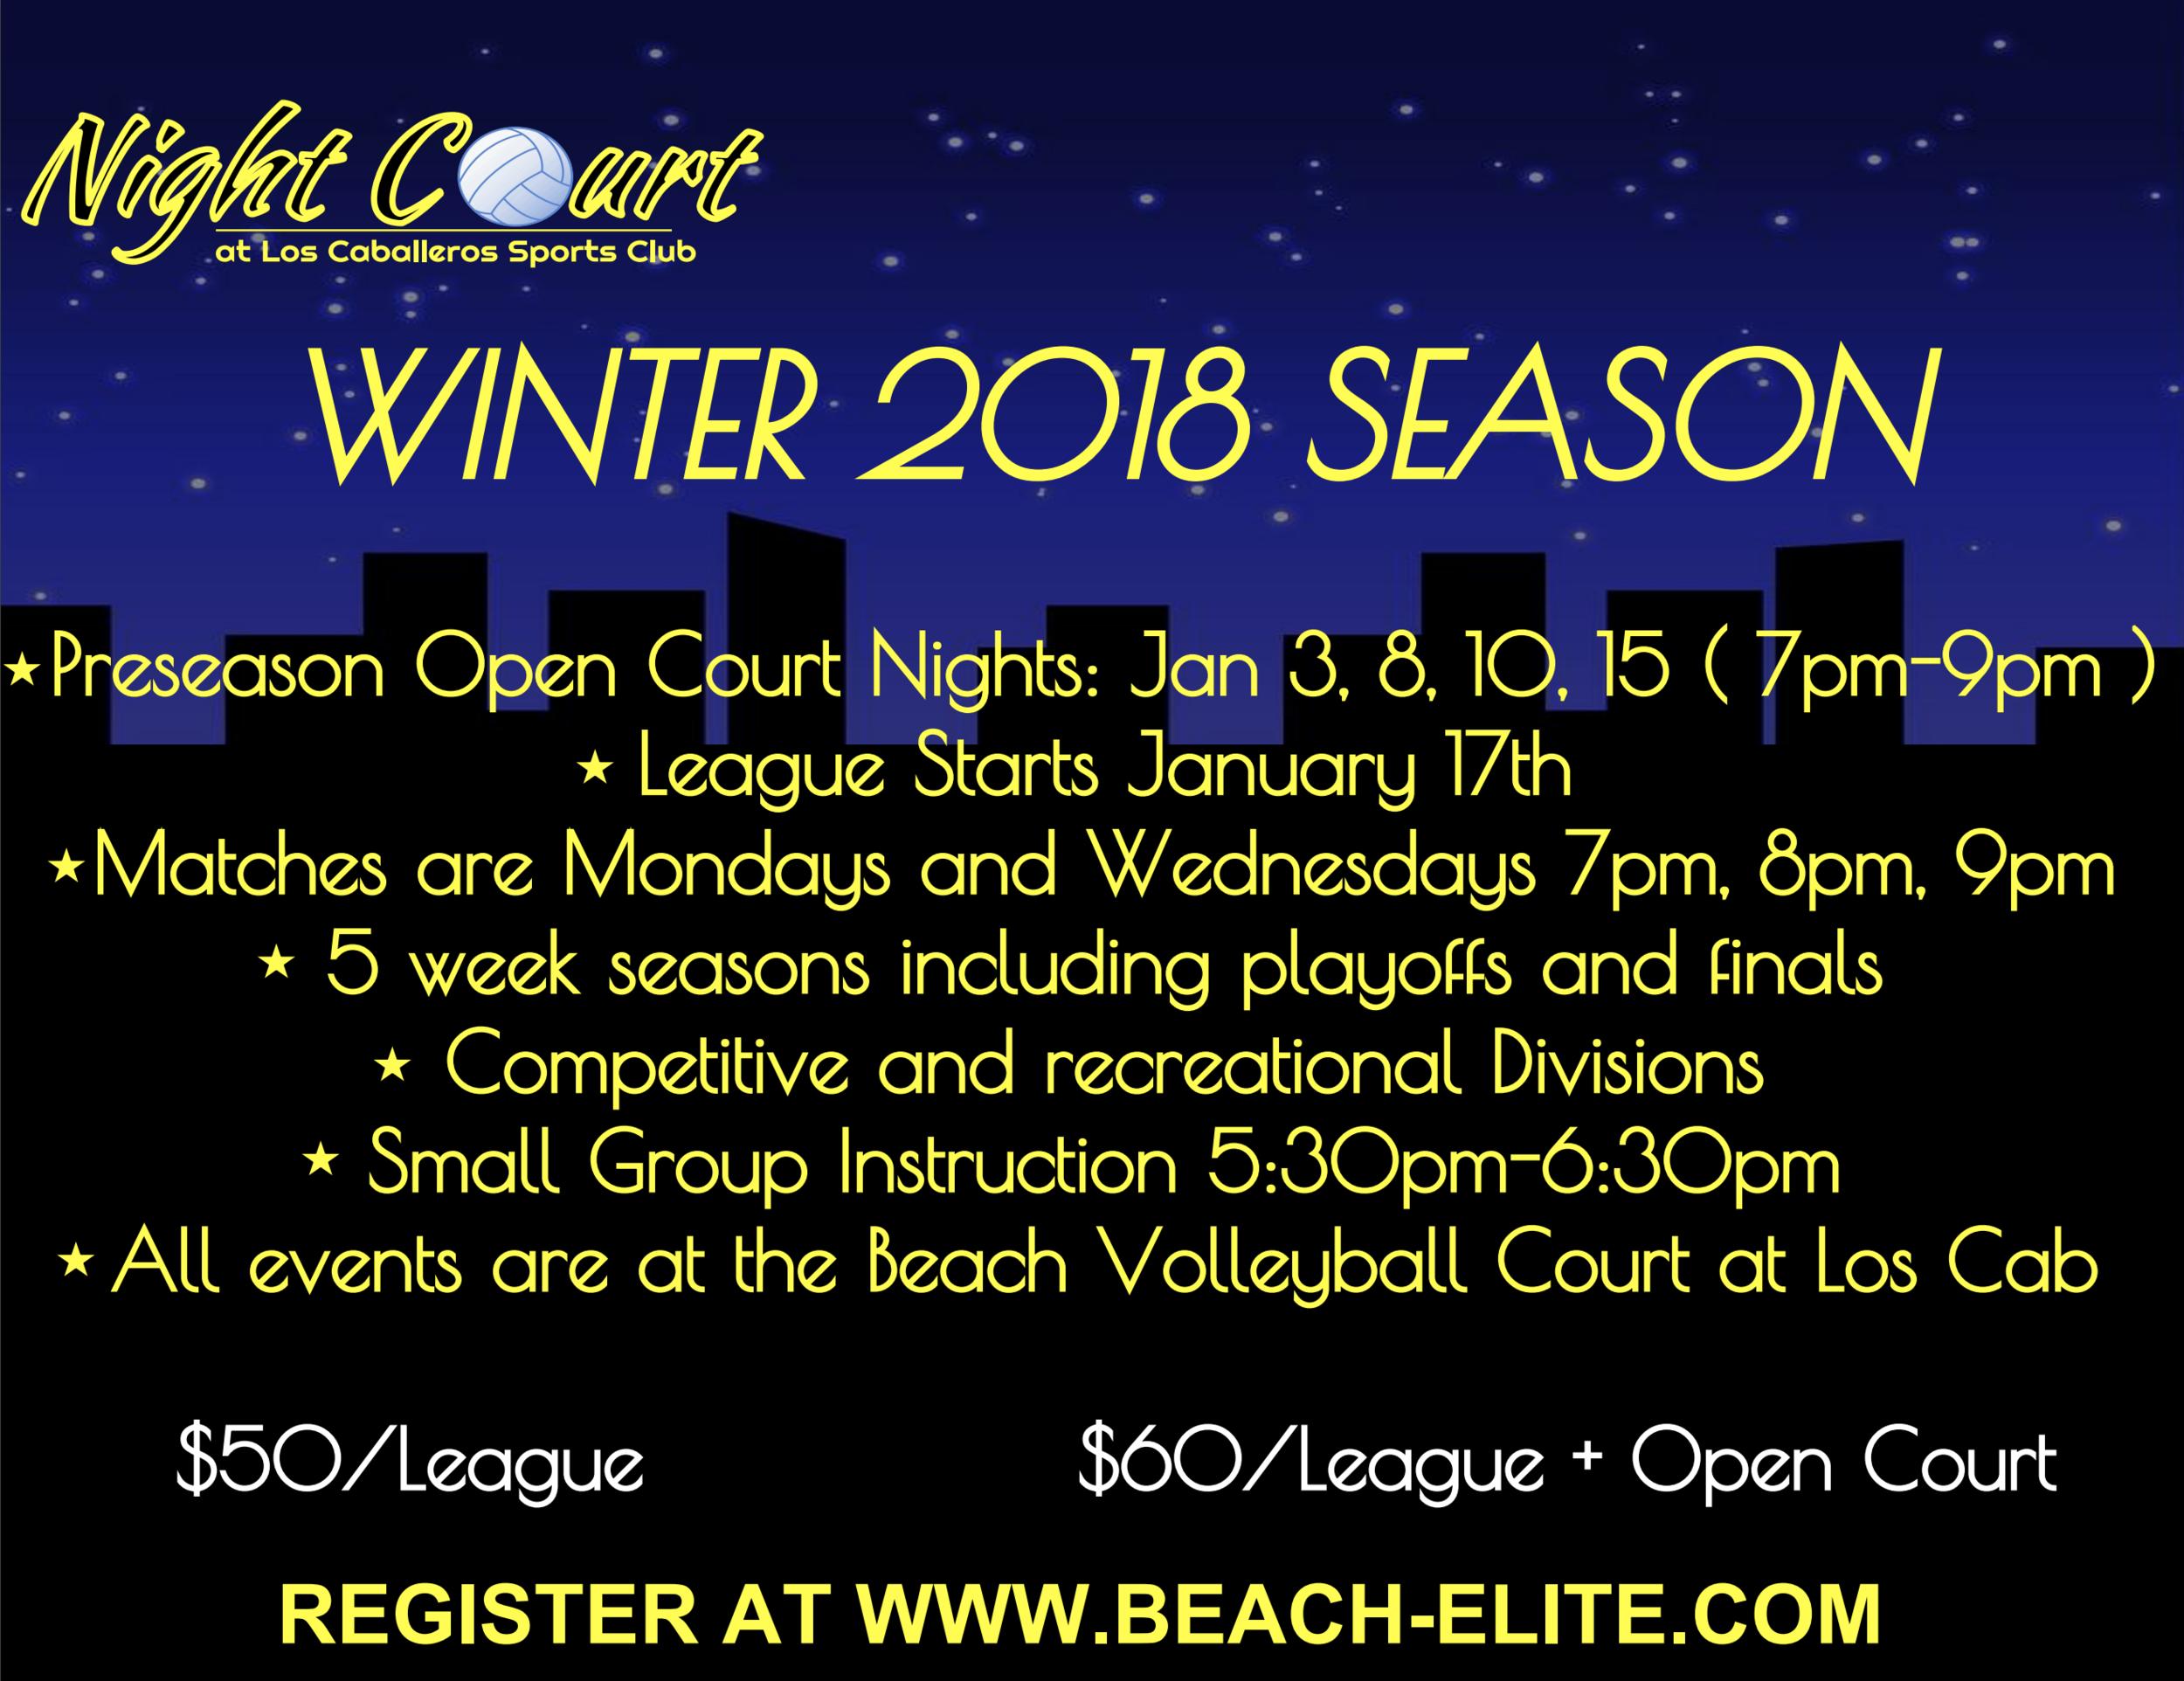 Adult Coed Night Beach Volleyball! - Season starts January 17th!